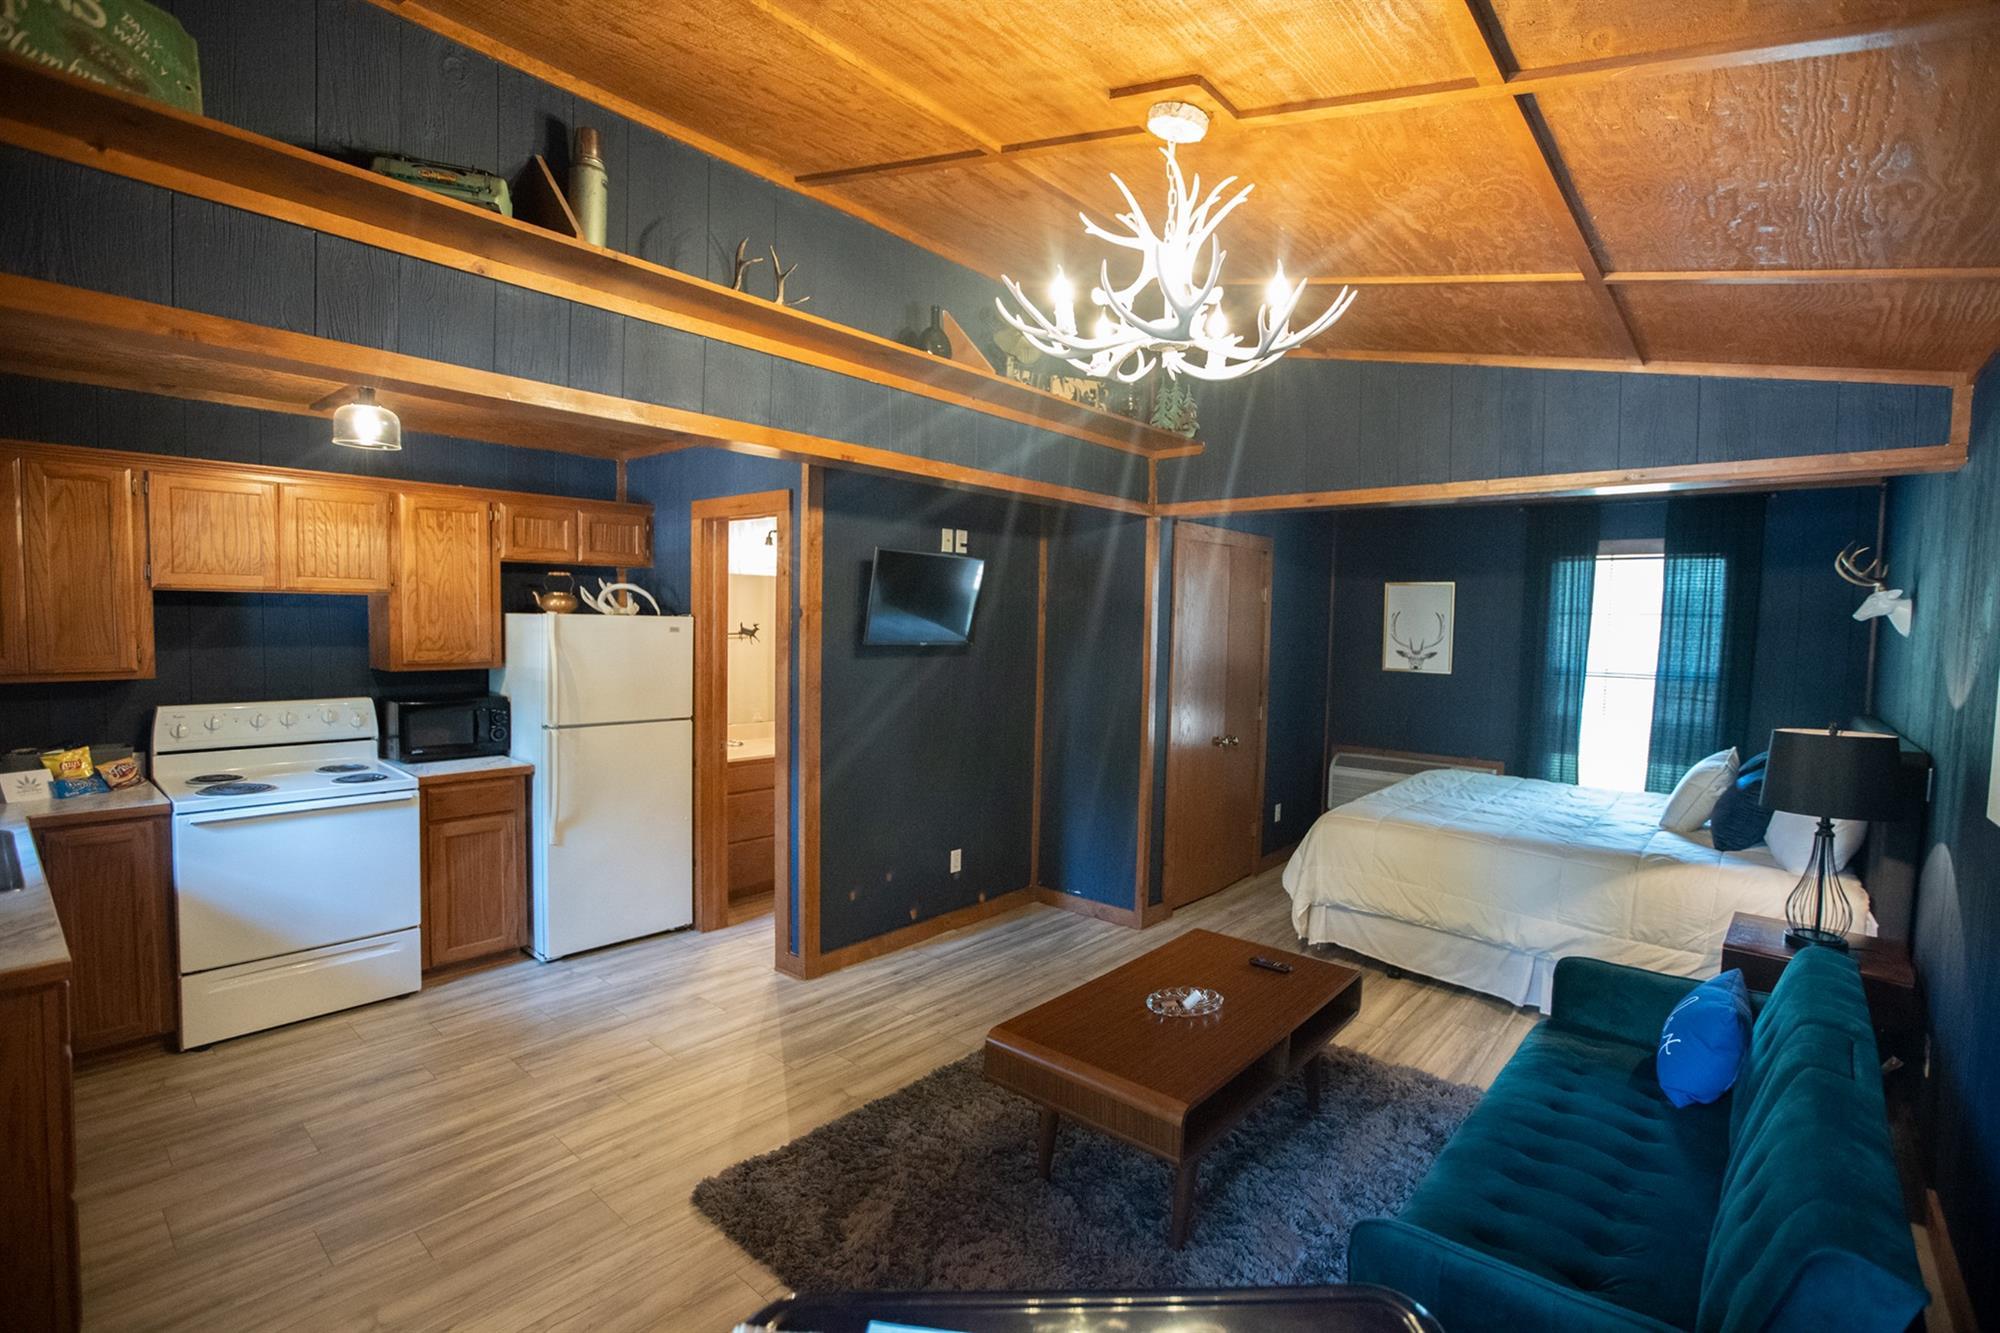 Image for 03) Kush Cabin Lodge